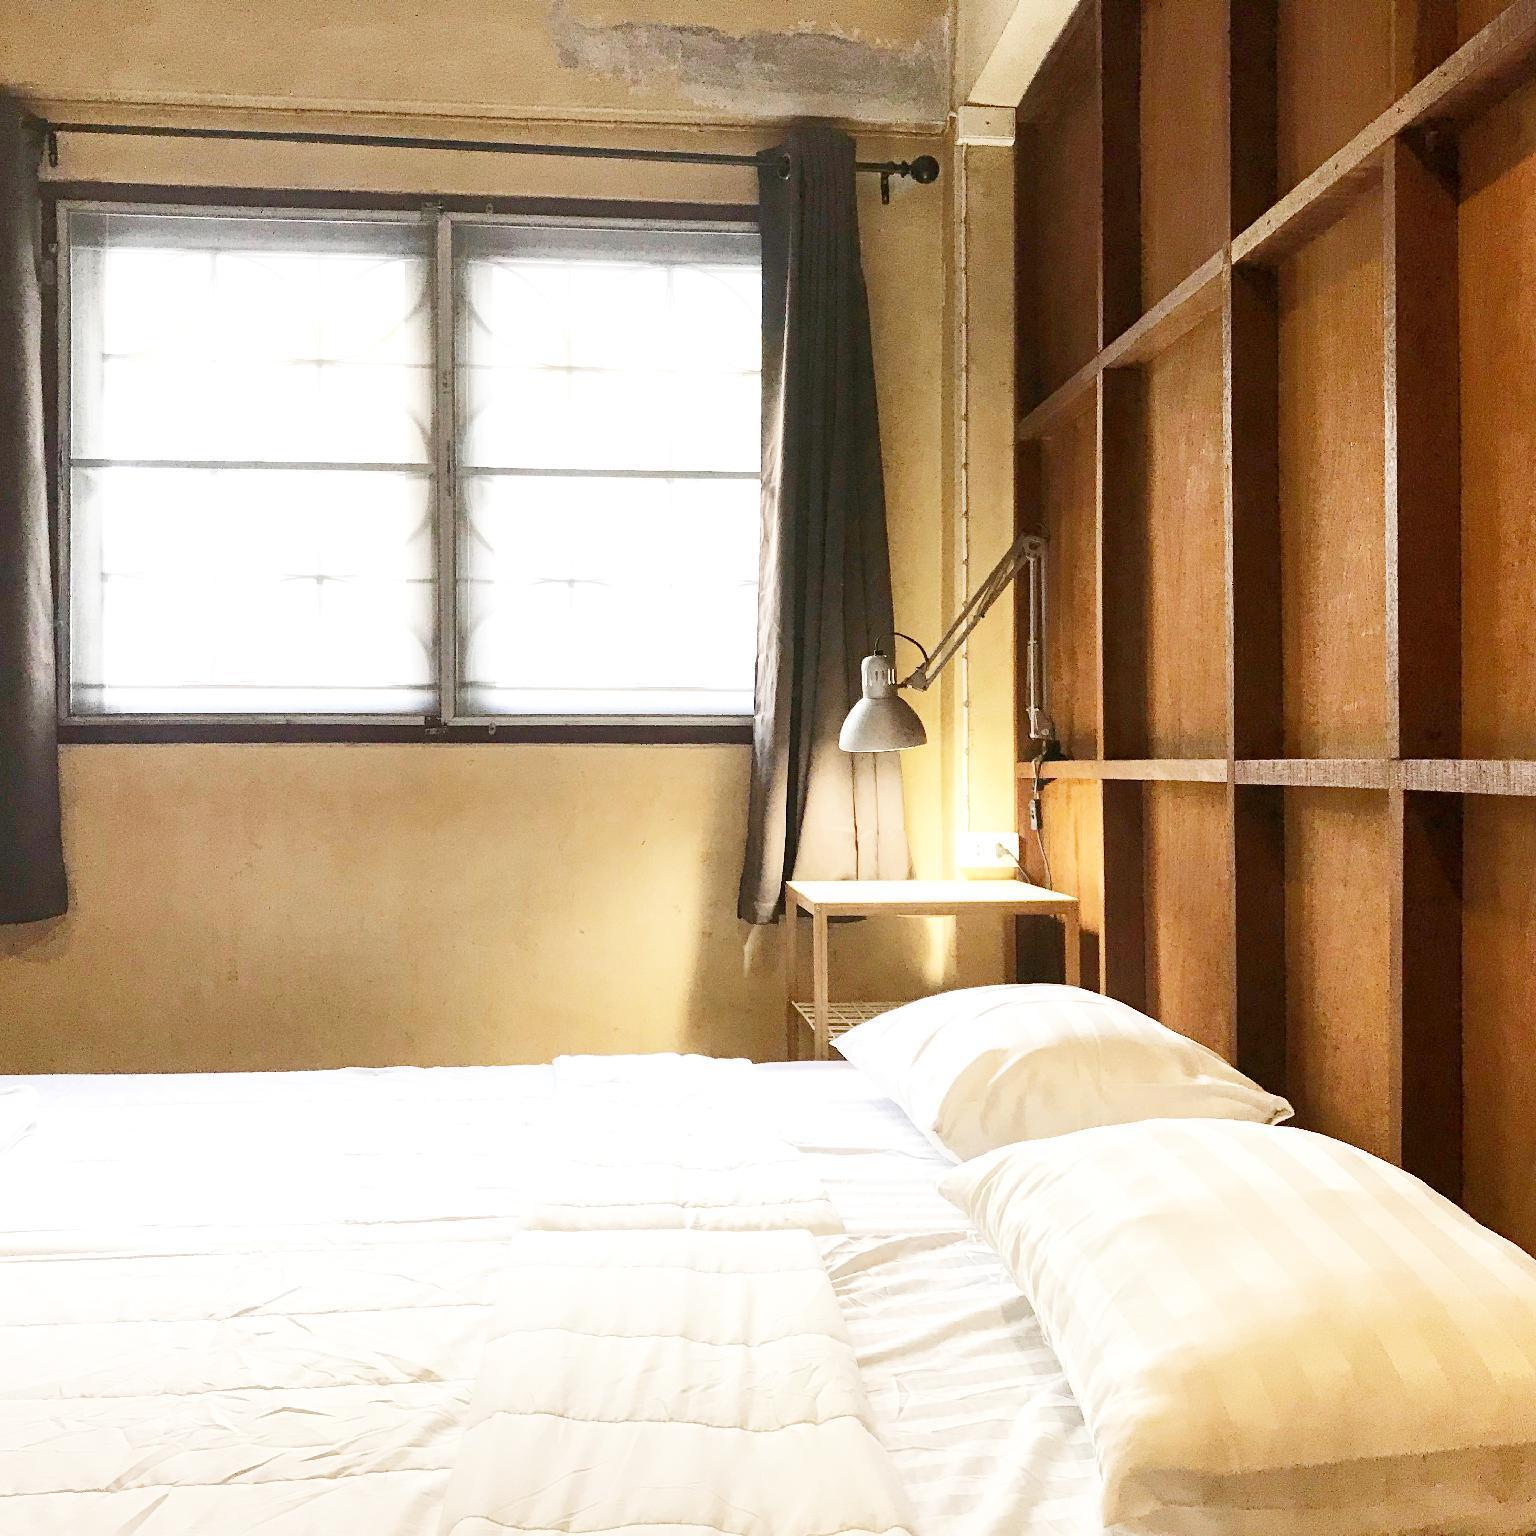 Buddy  Private Room  By Boundary Hostel Cafe